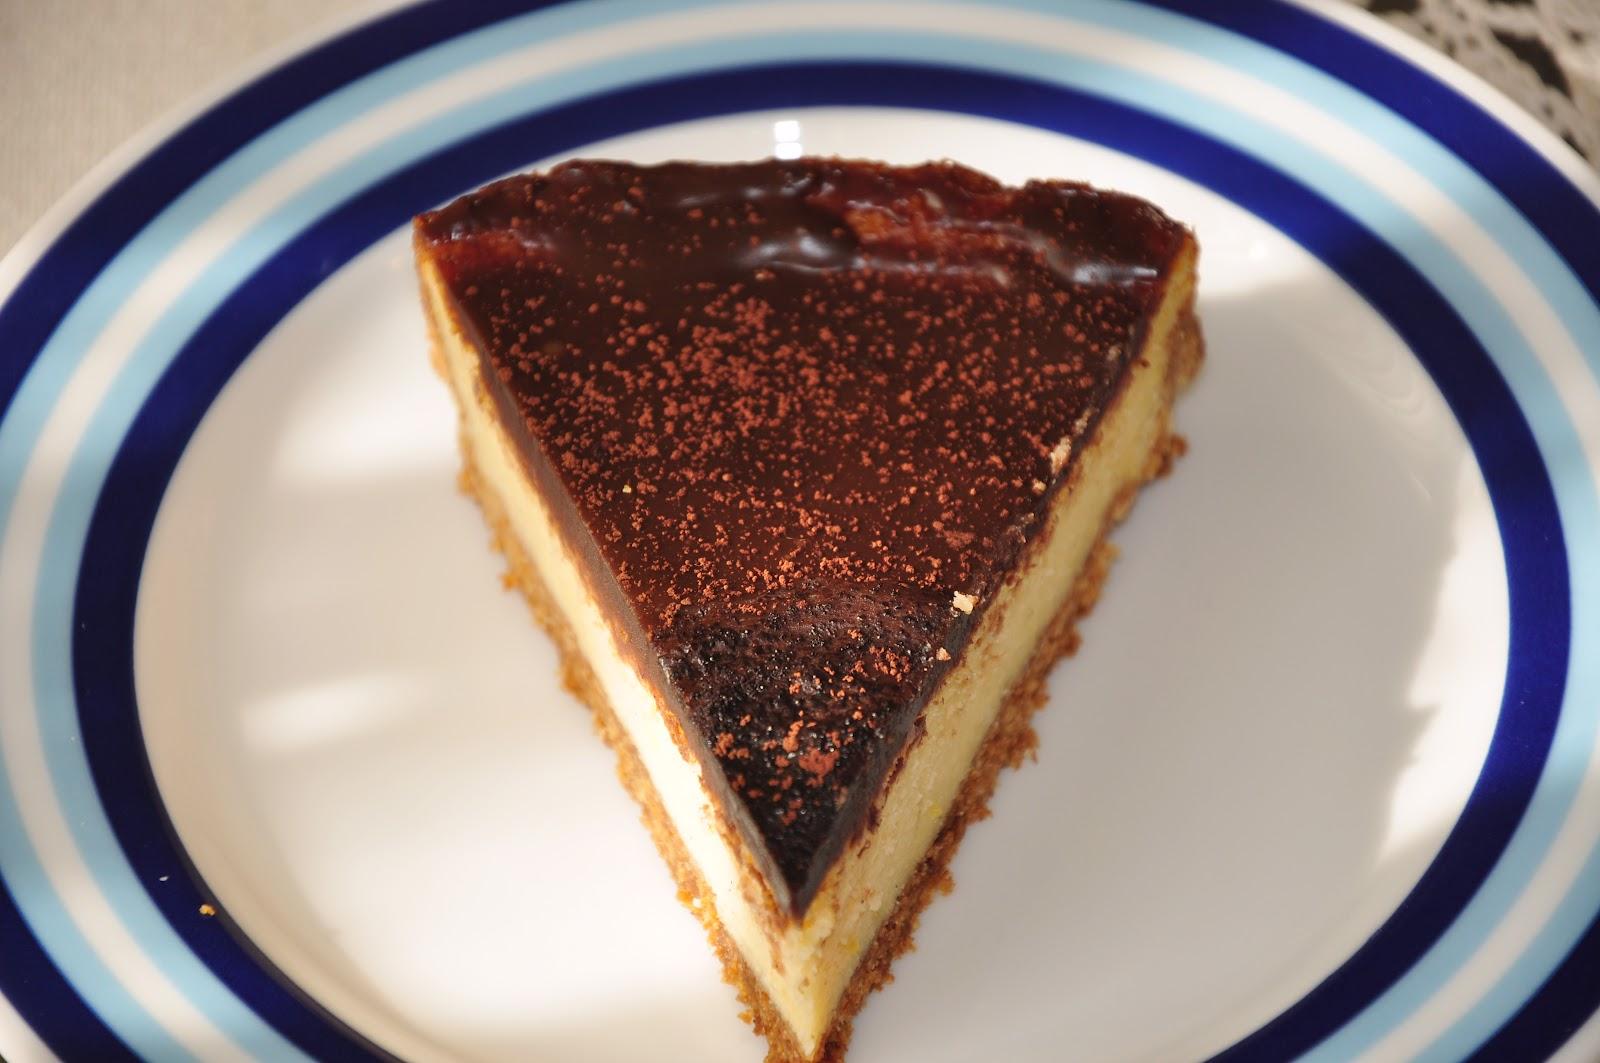 Lor Peynirli Limonlu Cheesecake